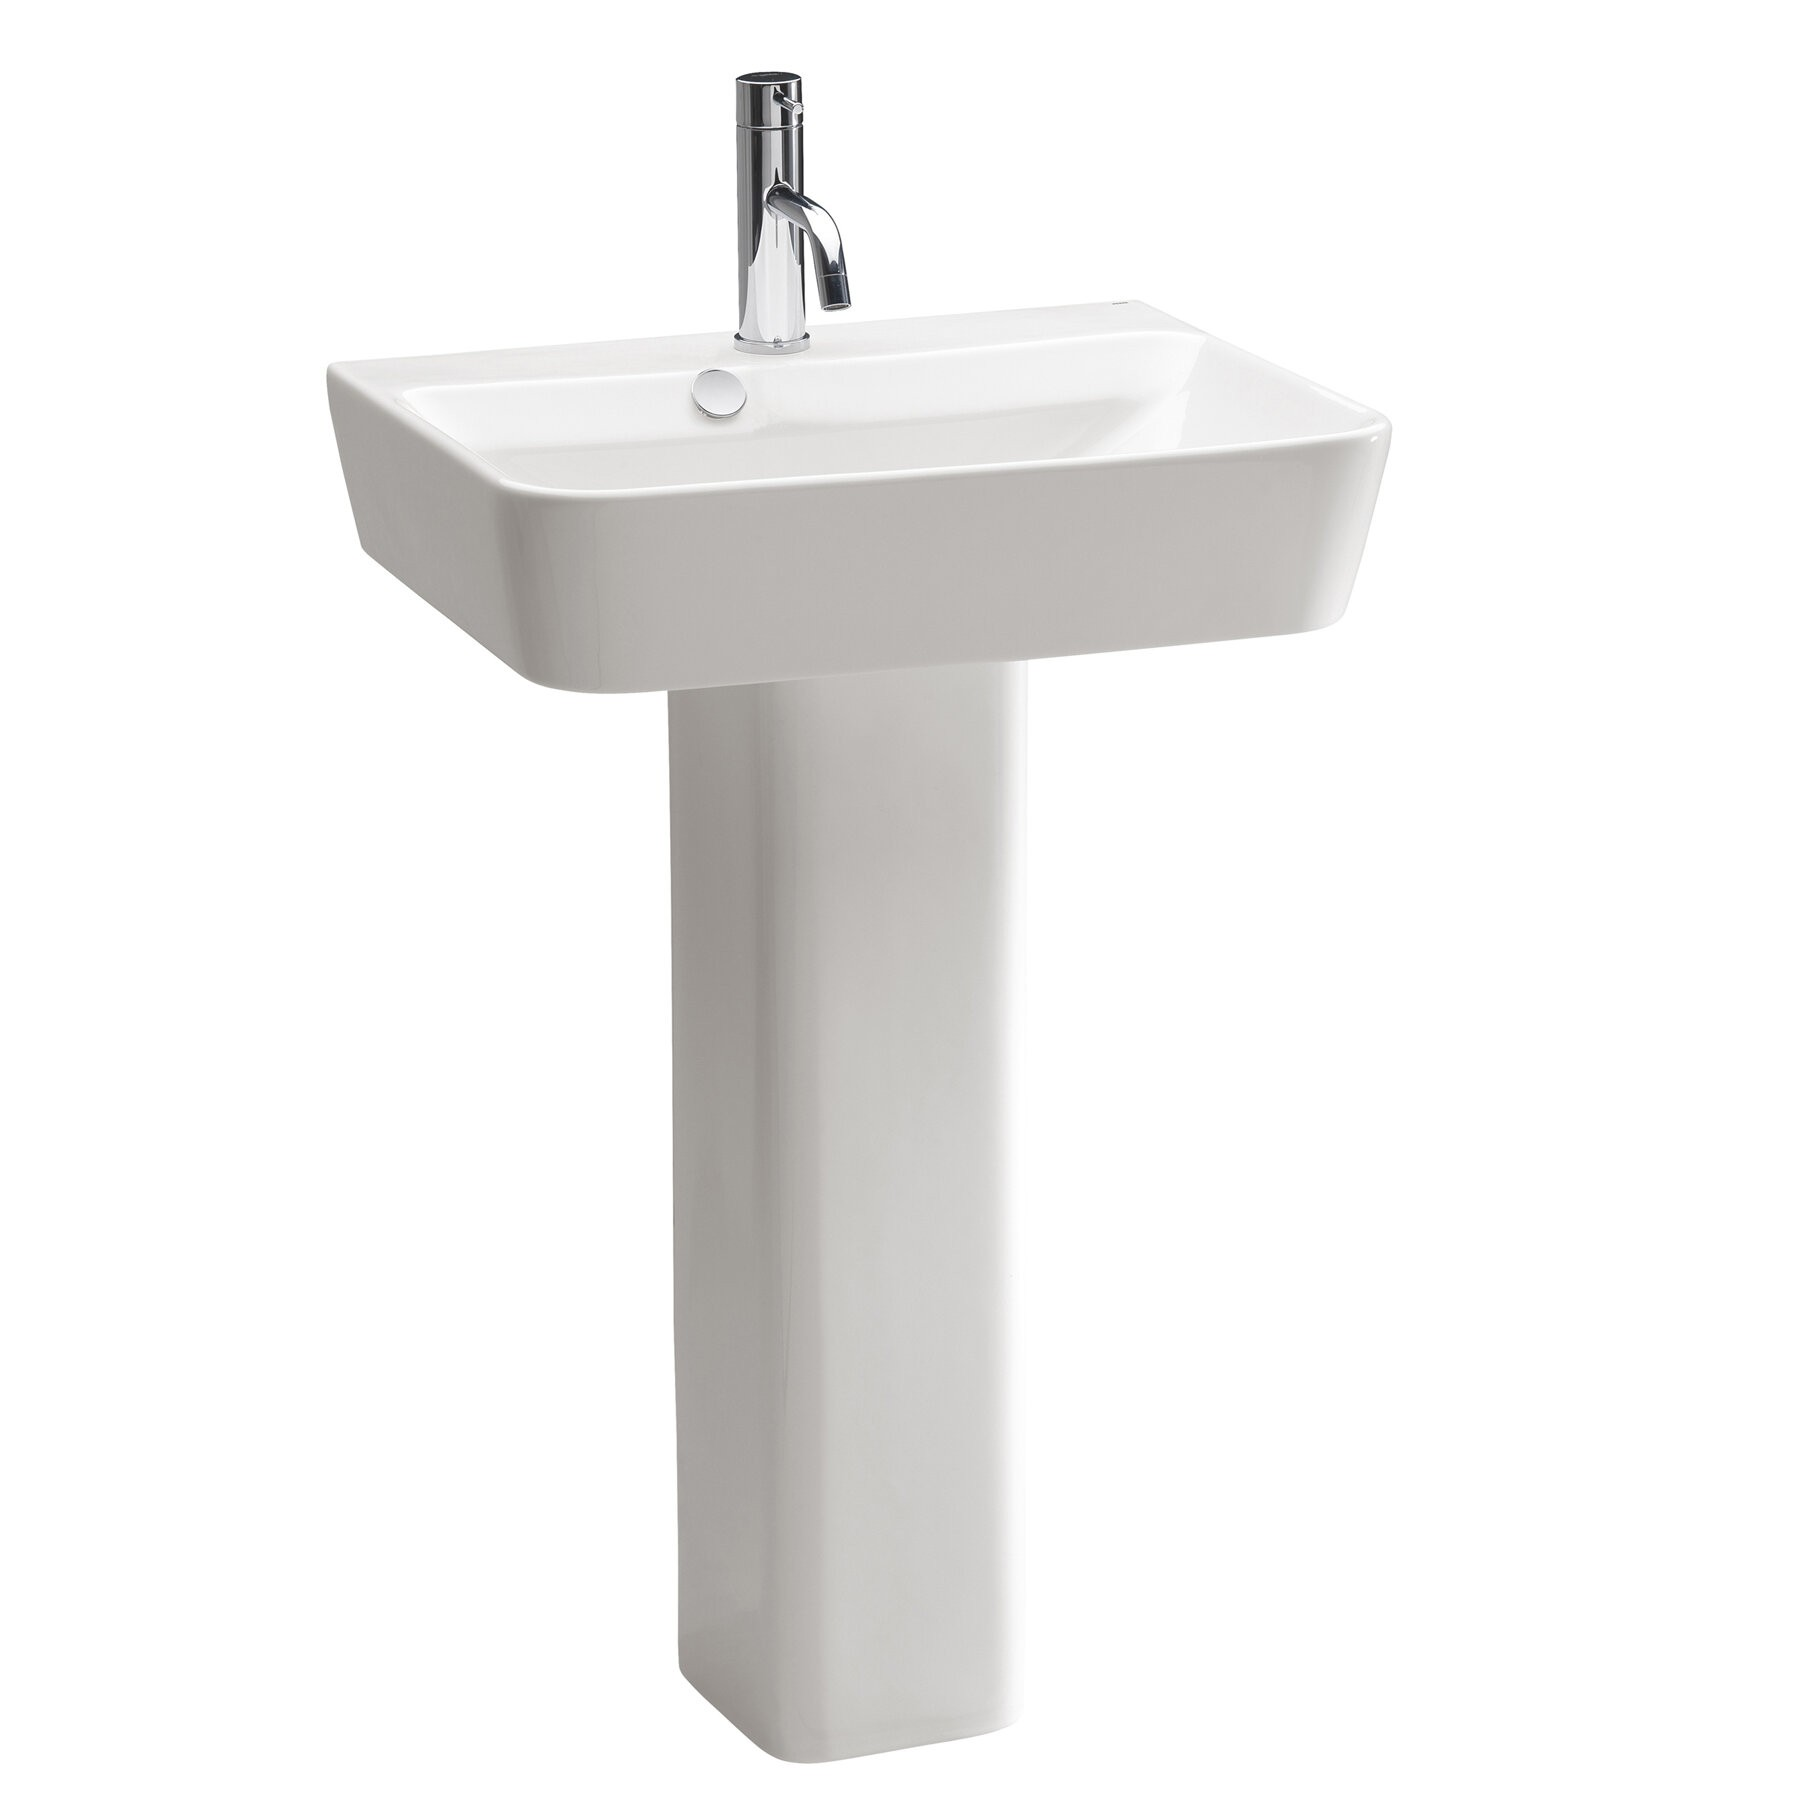 Merveilleux Emma Pedestal Bathroom Sink